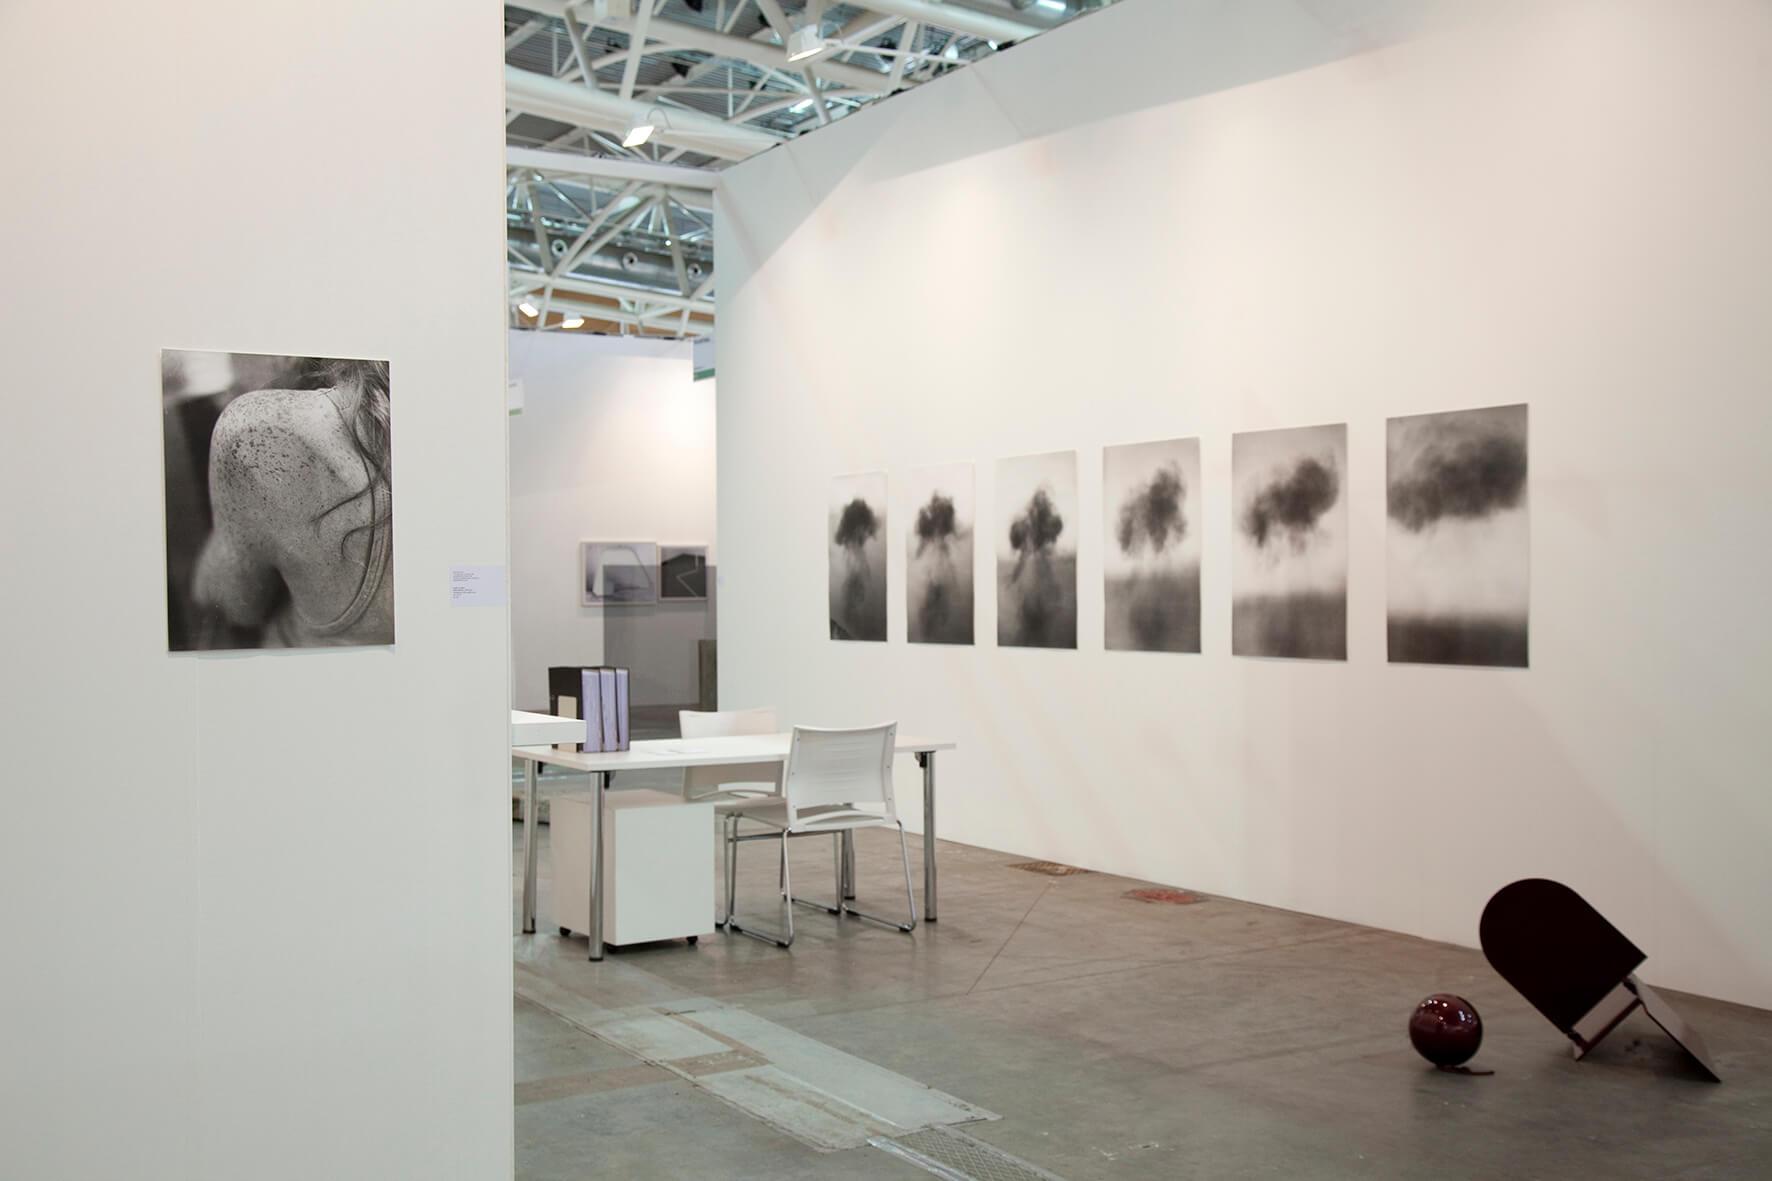 Installation view: ProjecteSD. Hall Violet Nº3 / Hall Green Nº4 | ARTISSIMA 2014 | ProjecteSD